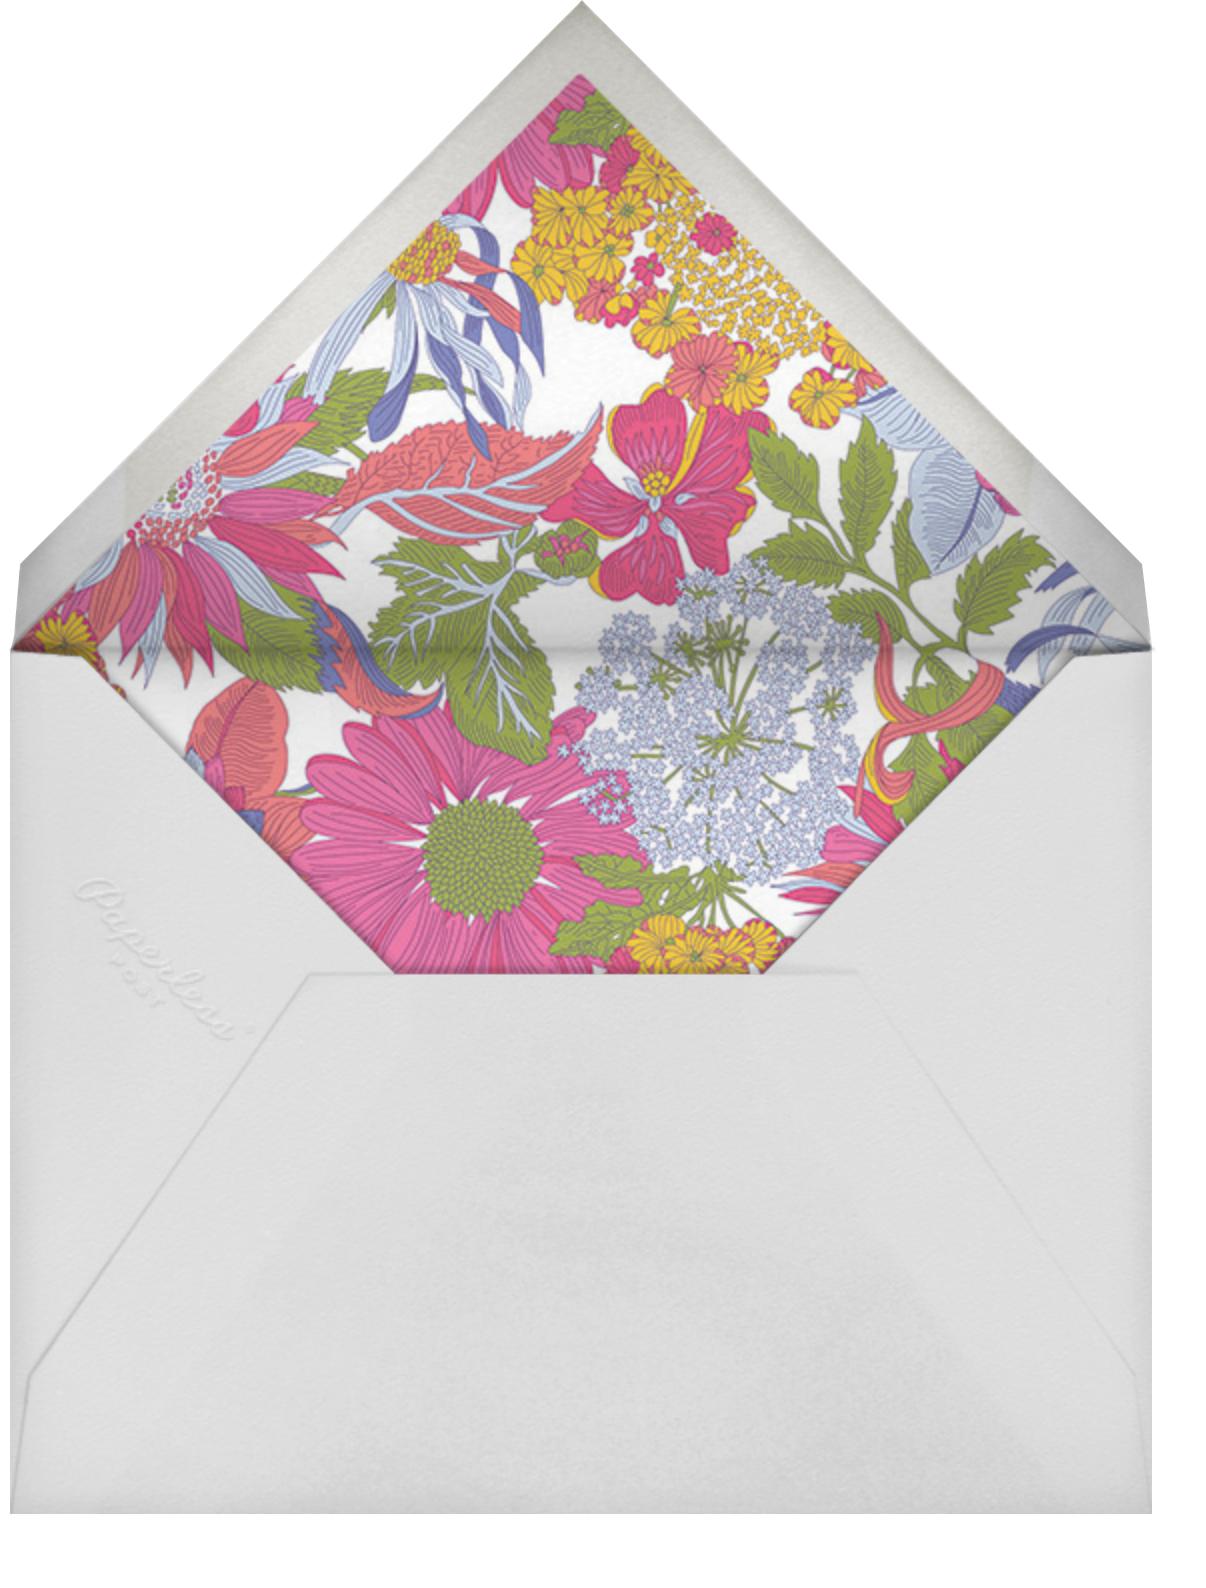 Angelica Garla (Invitation) - Liberty - Spring entertaining - envelope back